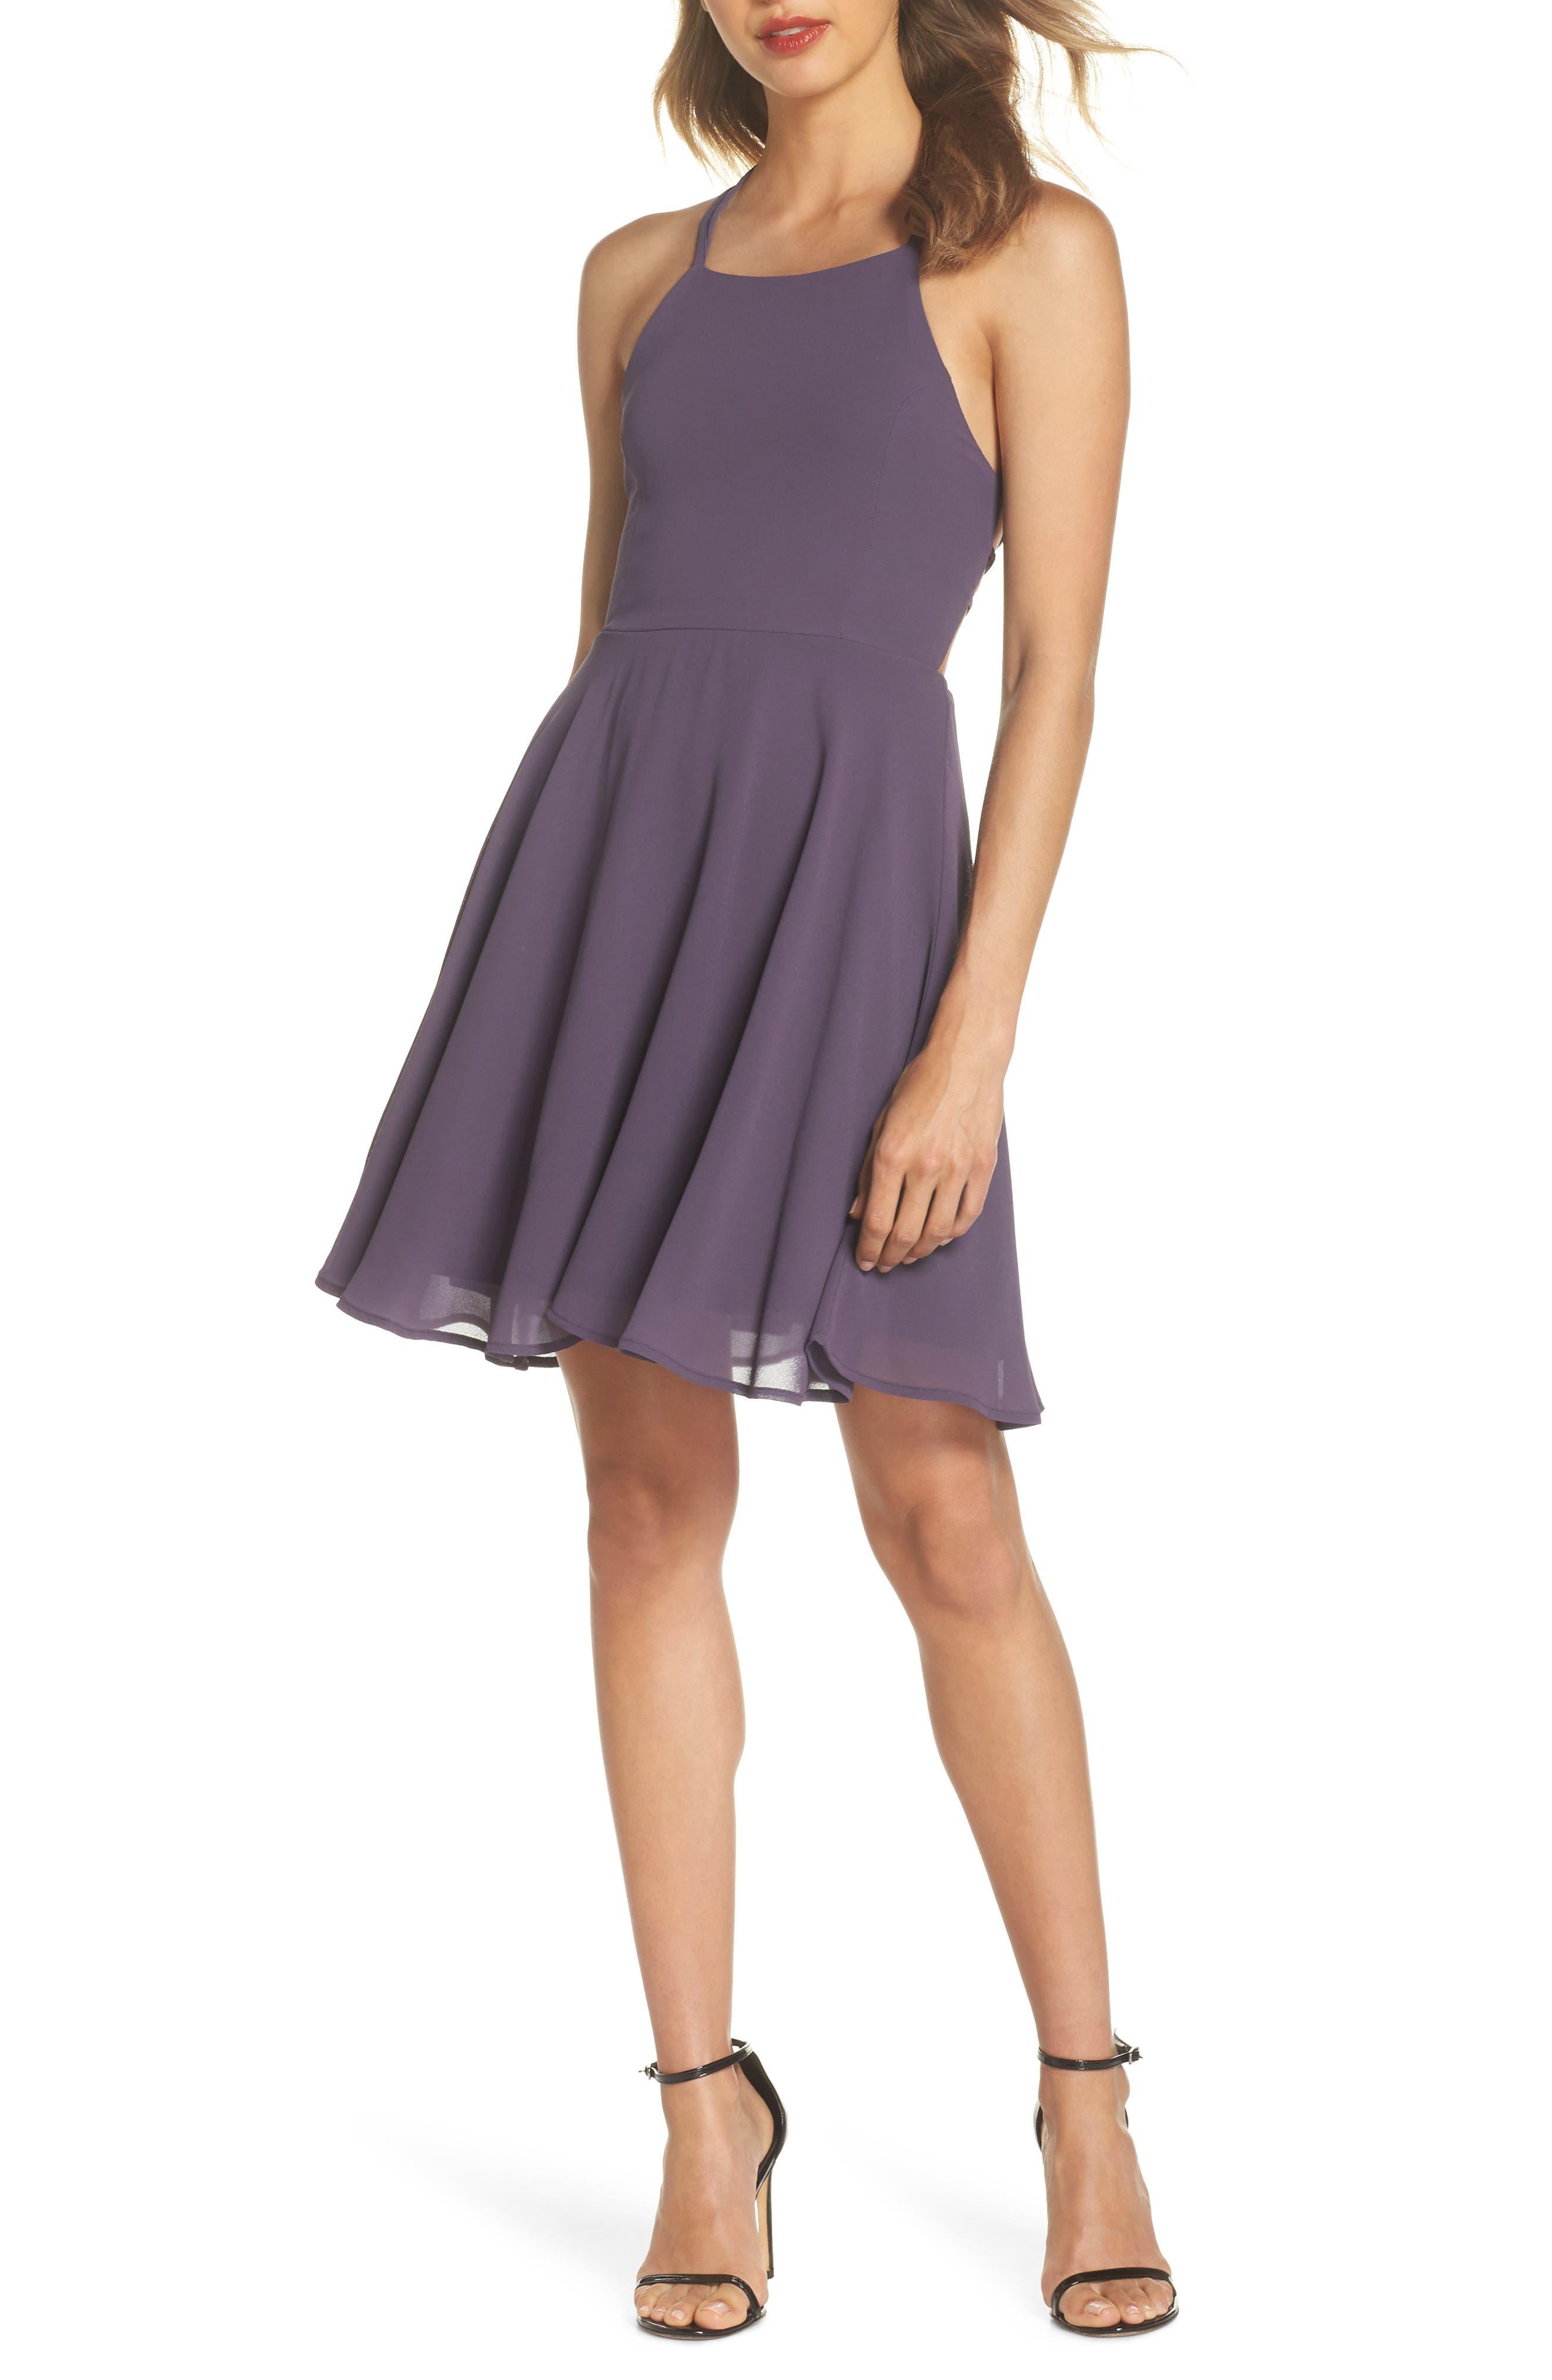 Lulus Good Deeds Lace-Up Skater Dress, Purple